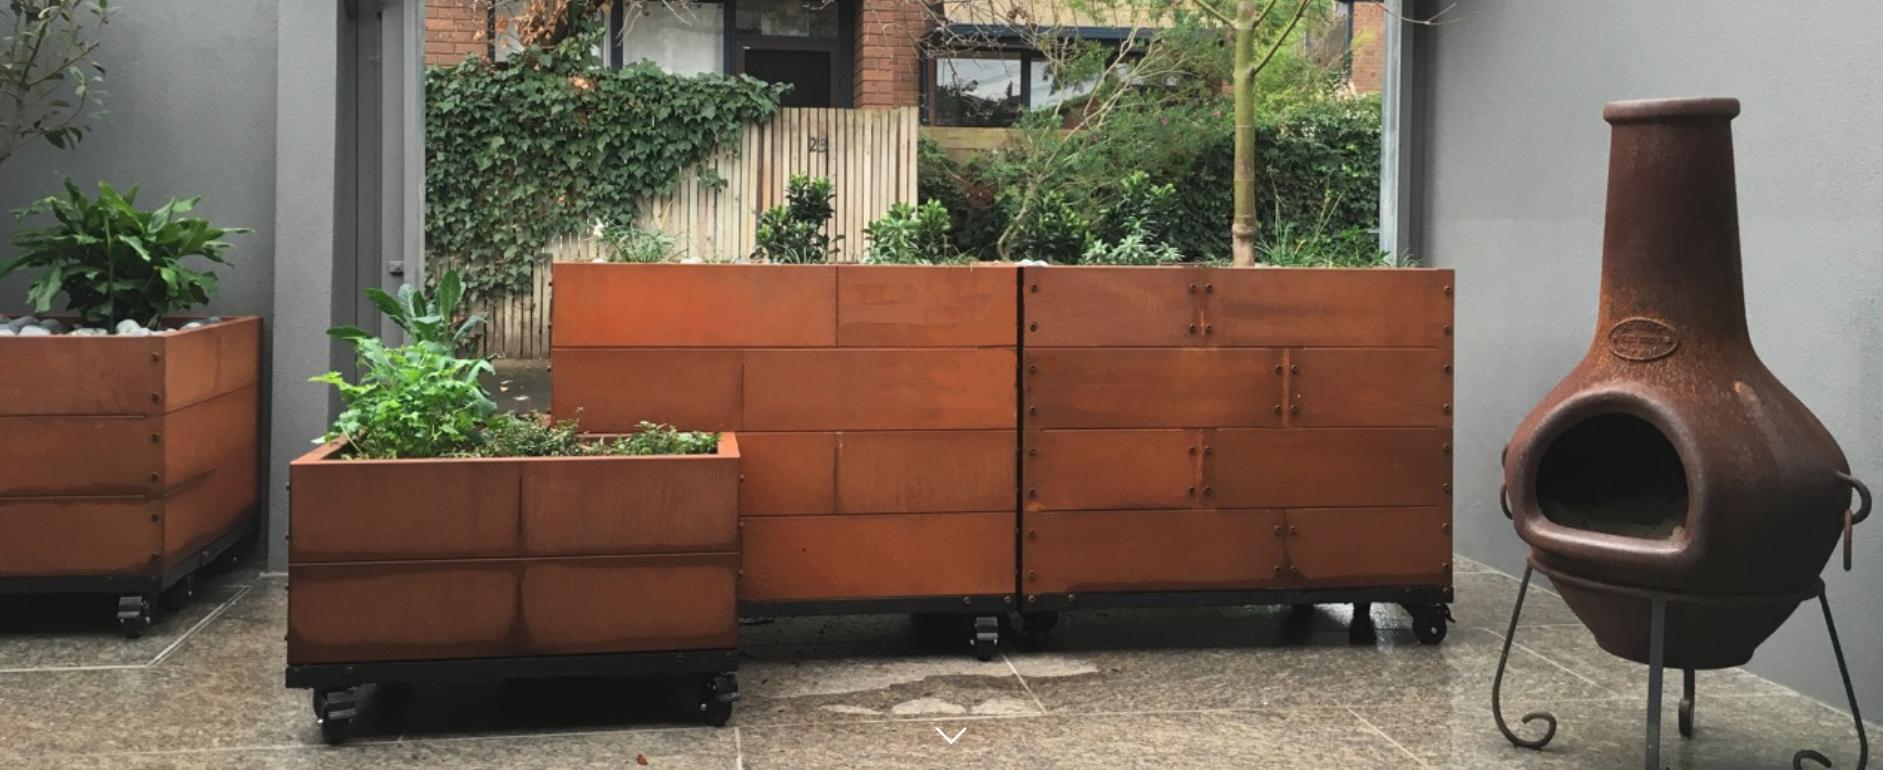 Abilitybox Modular Planter Box Garden Bed Moodie